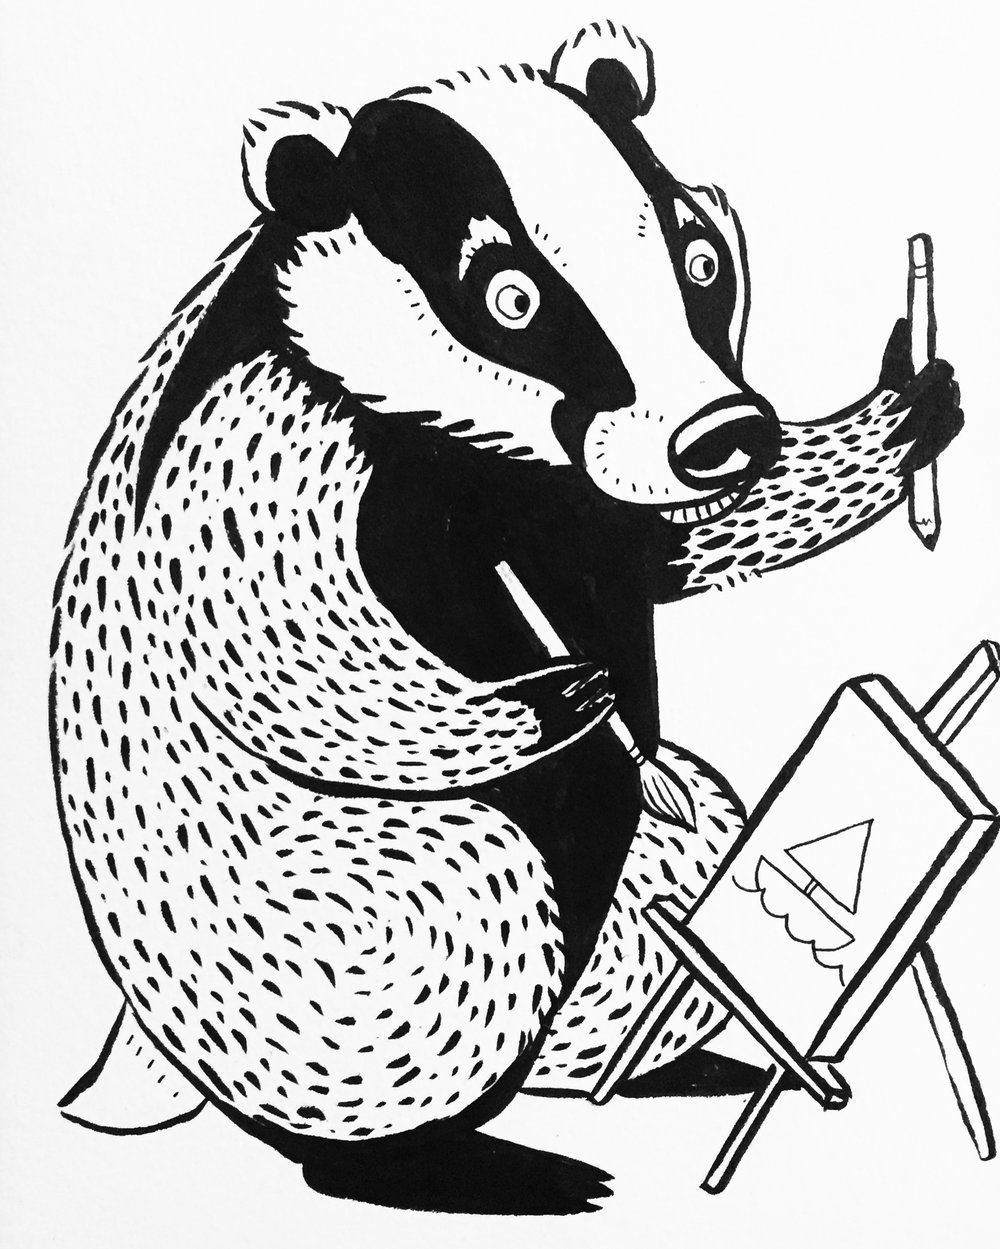 Artful Badger